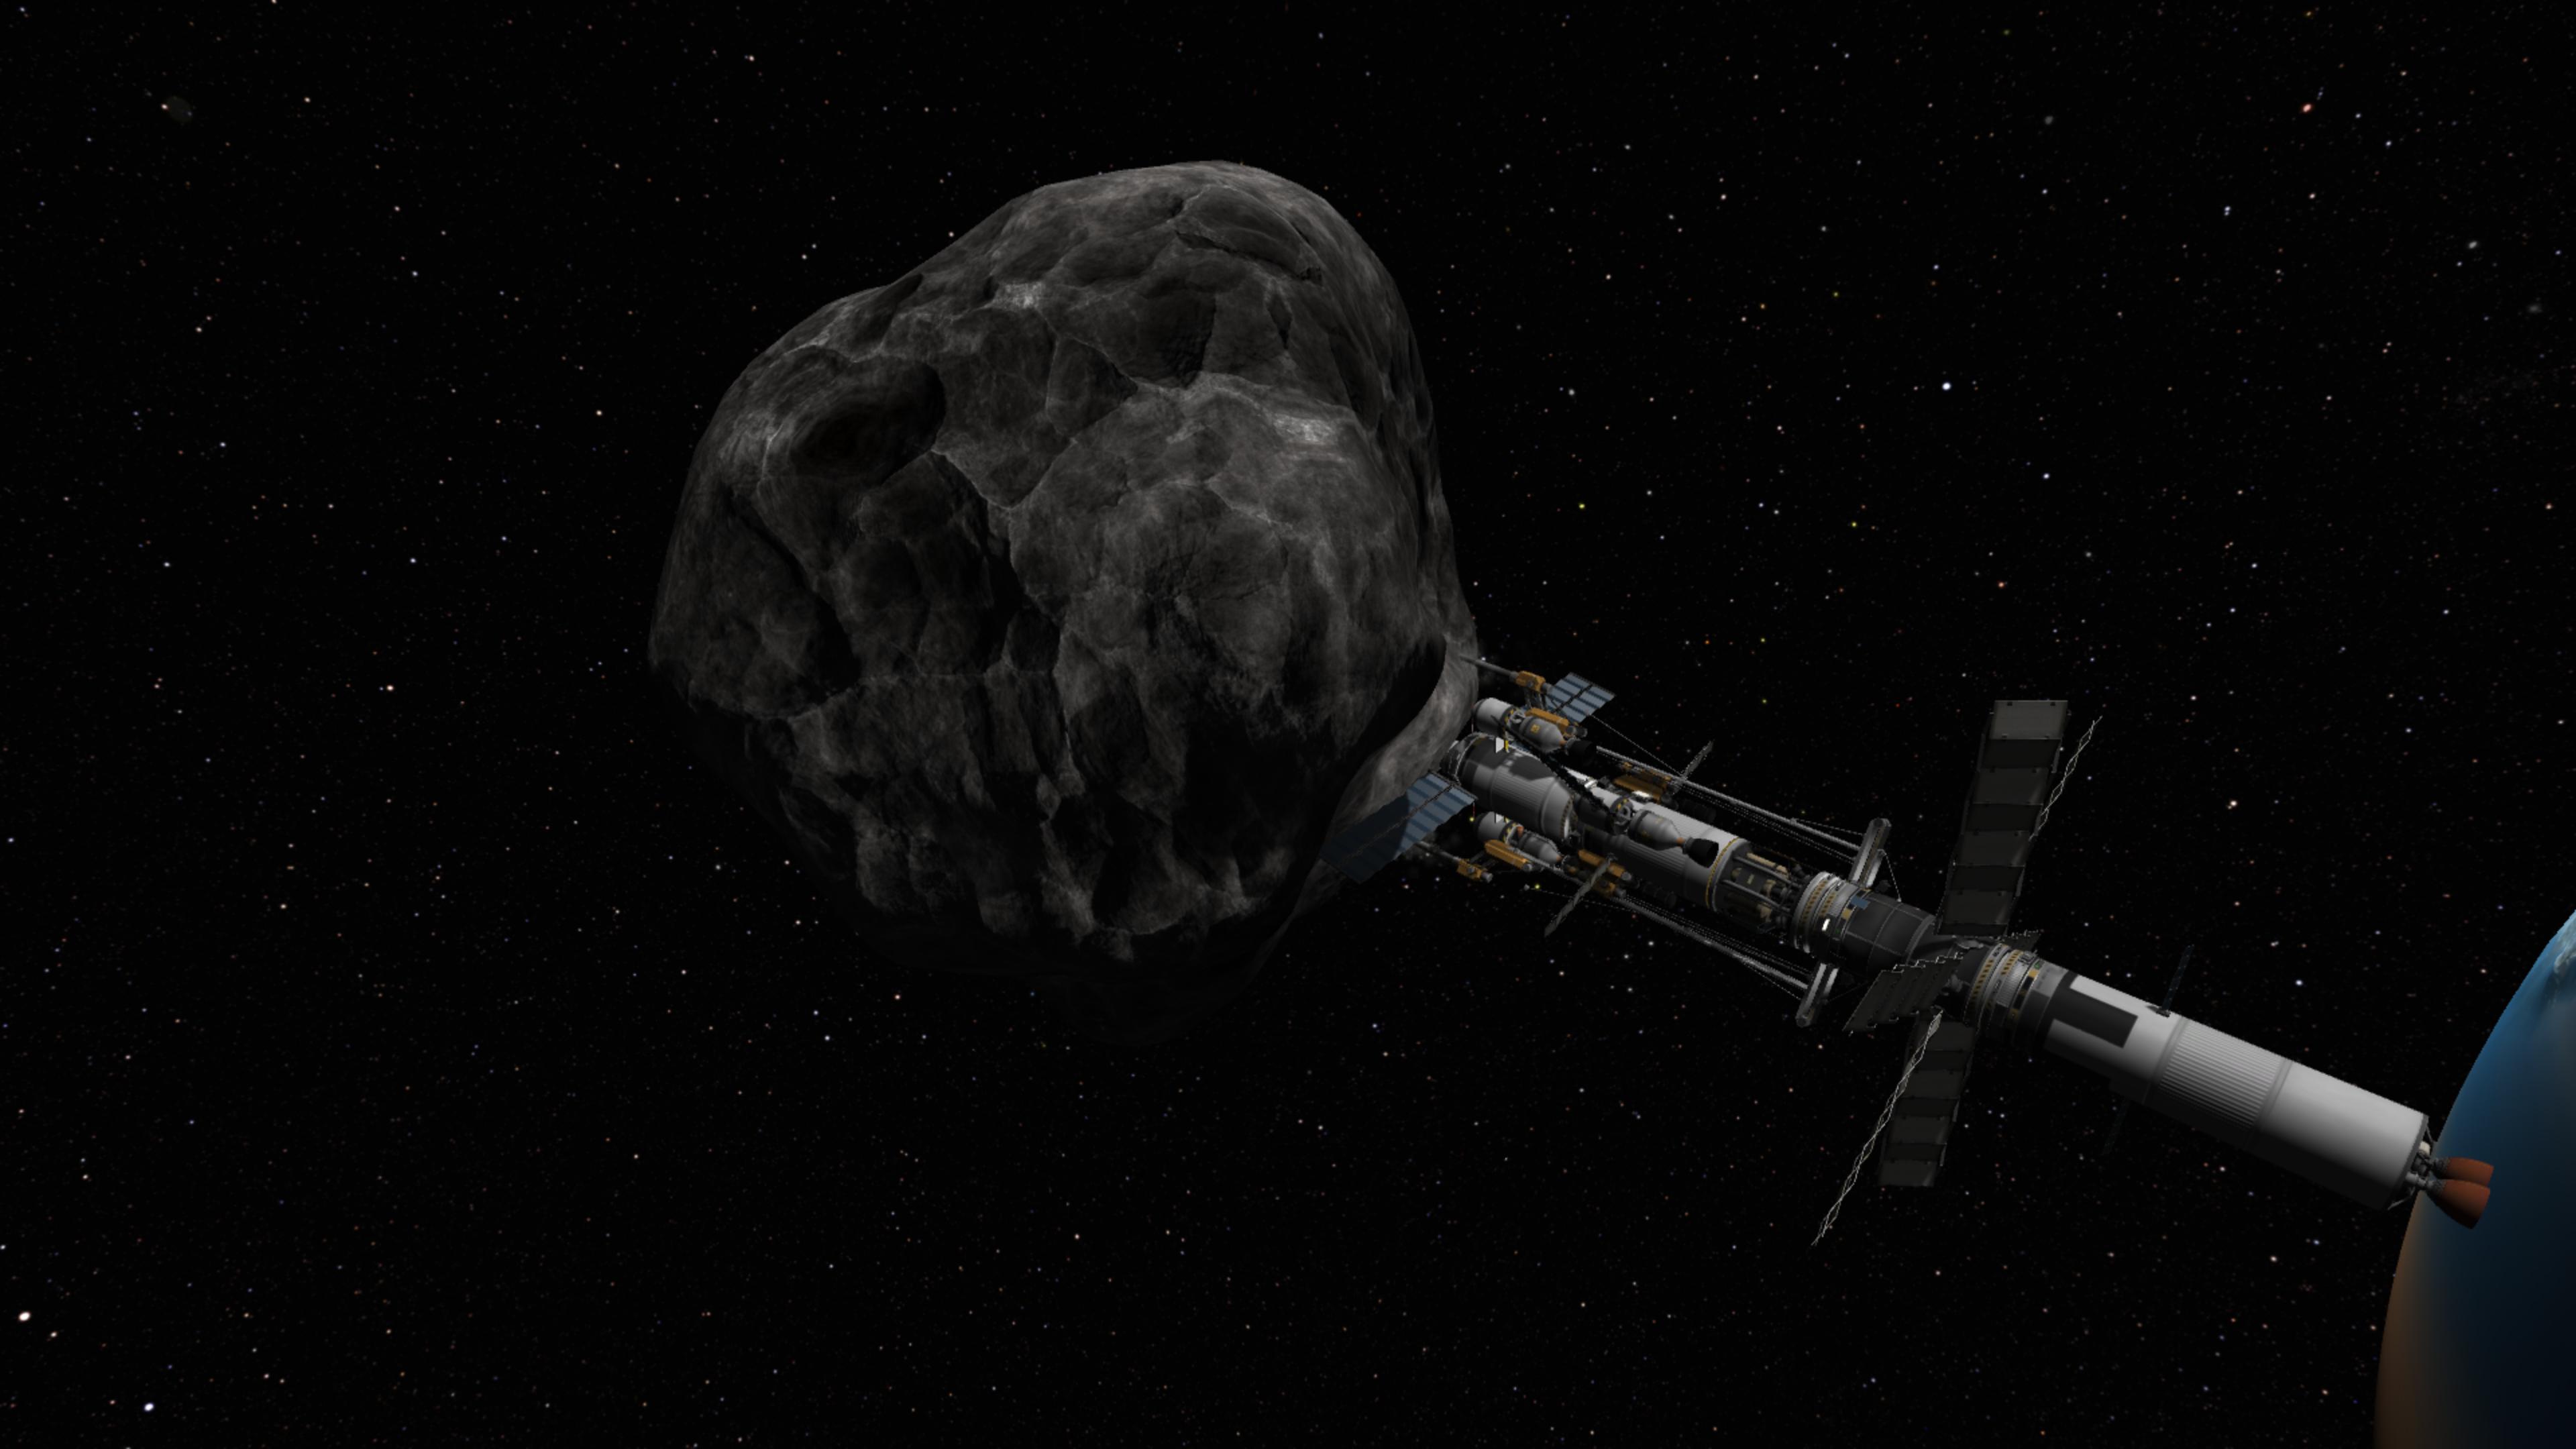 ksp_asteroid_fuel.png